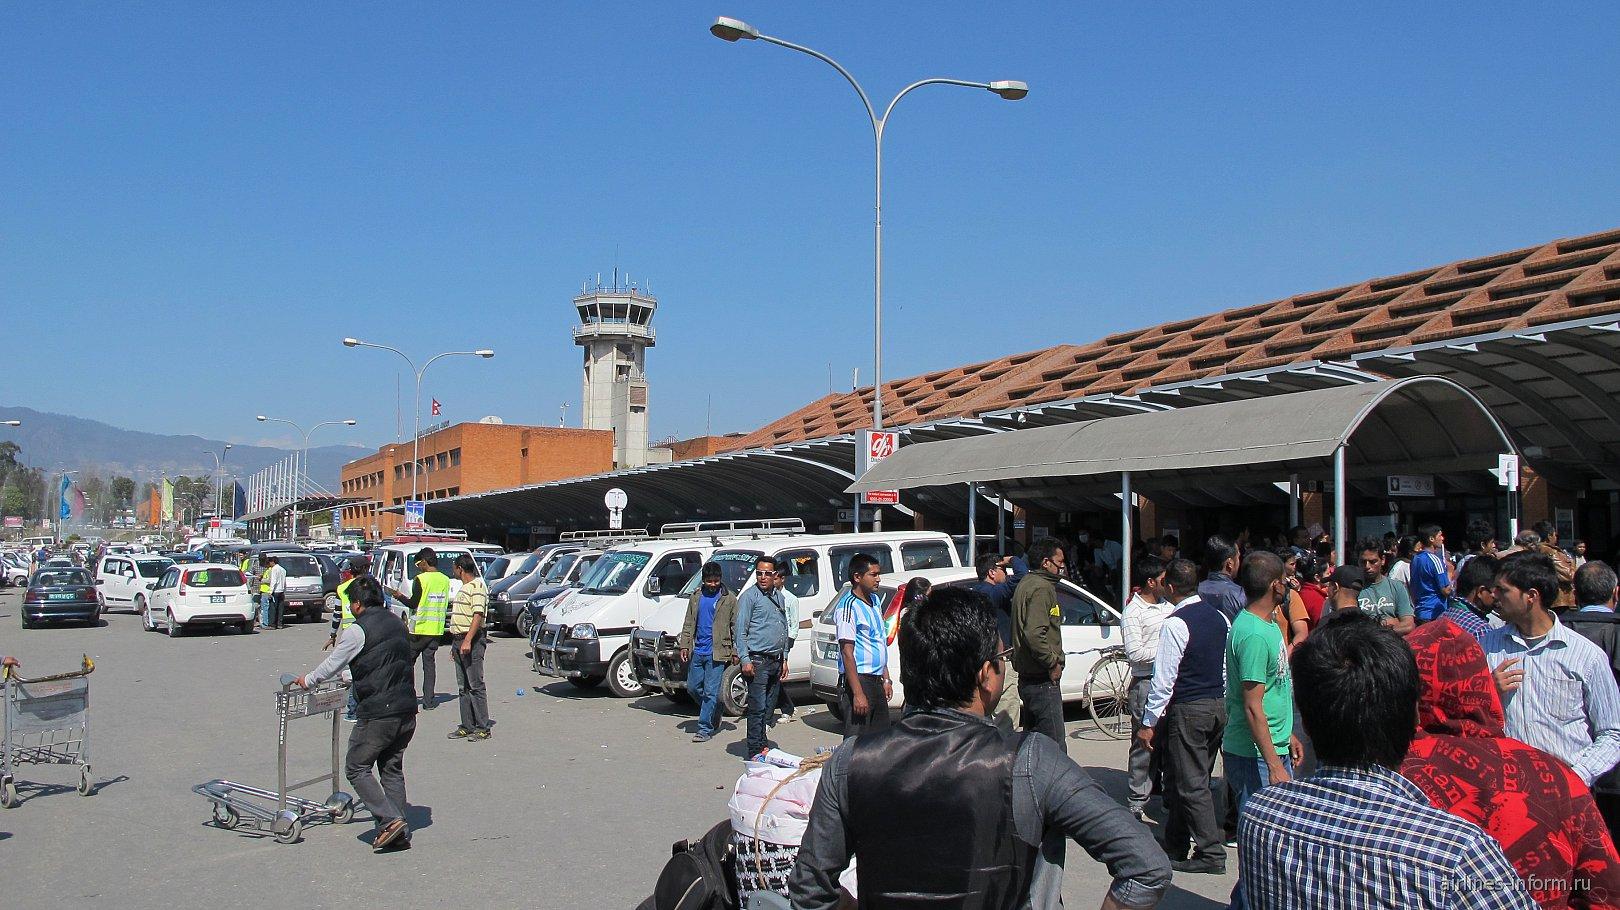 Международный терминал аэропорта Катманду Трибхуван